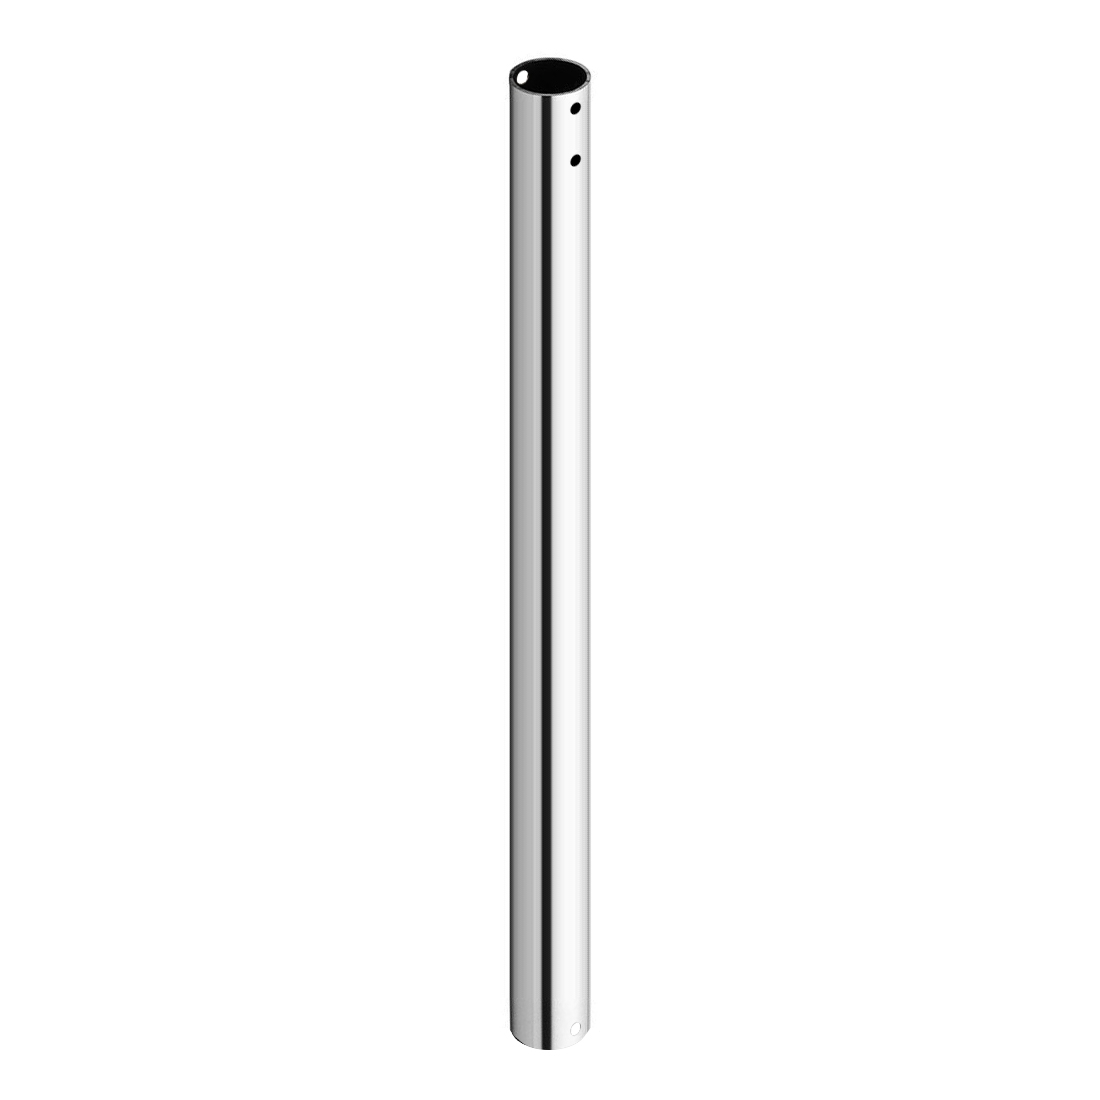 Peerless-AV MOD-P200 - Штанга диаметром 50,8 мм, длина 2000 мм